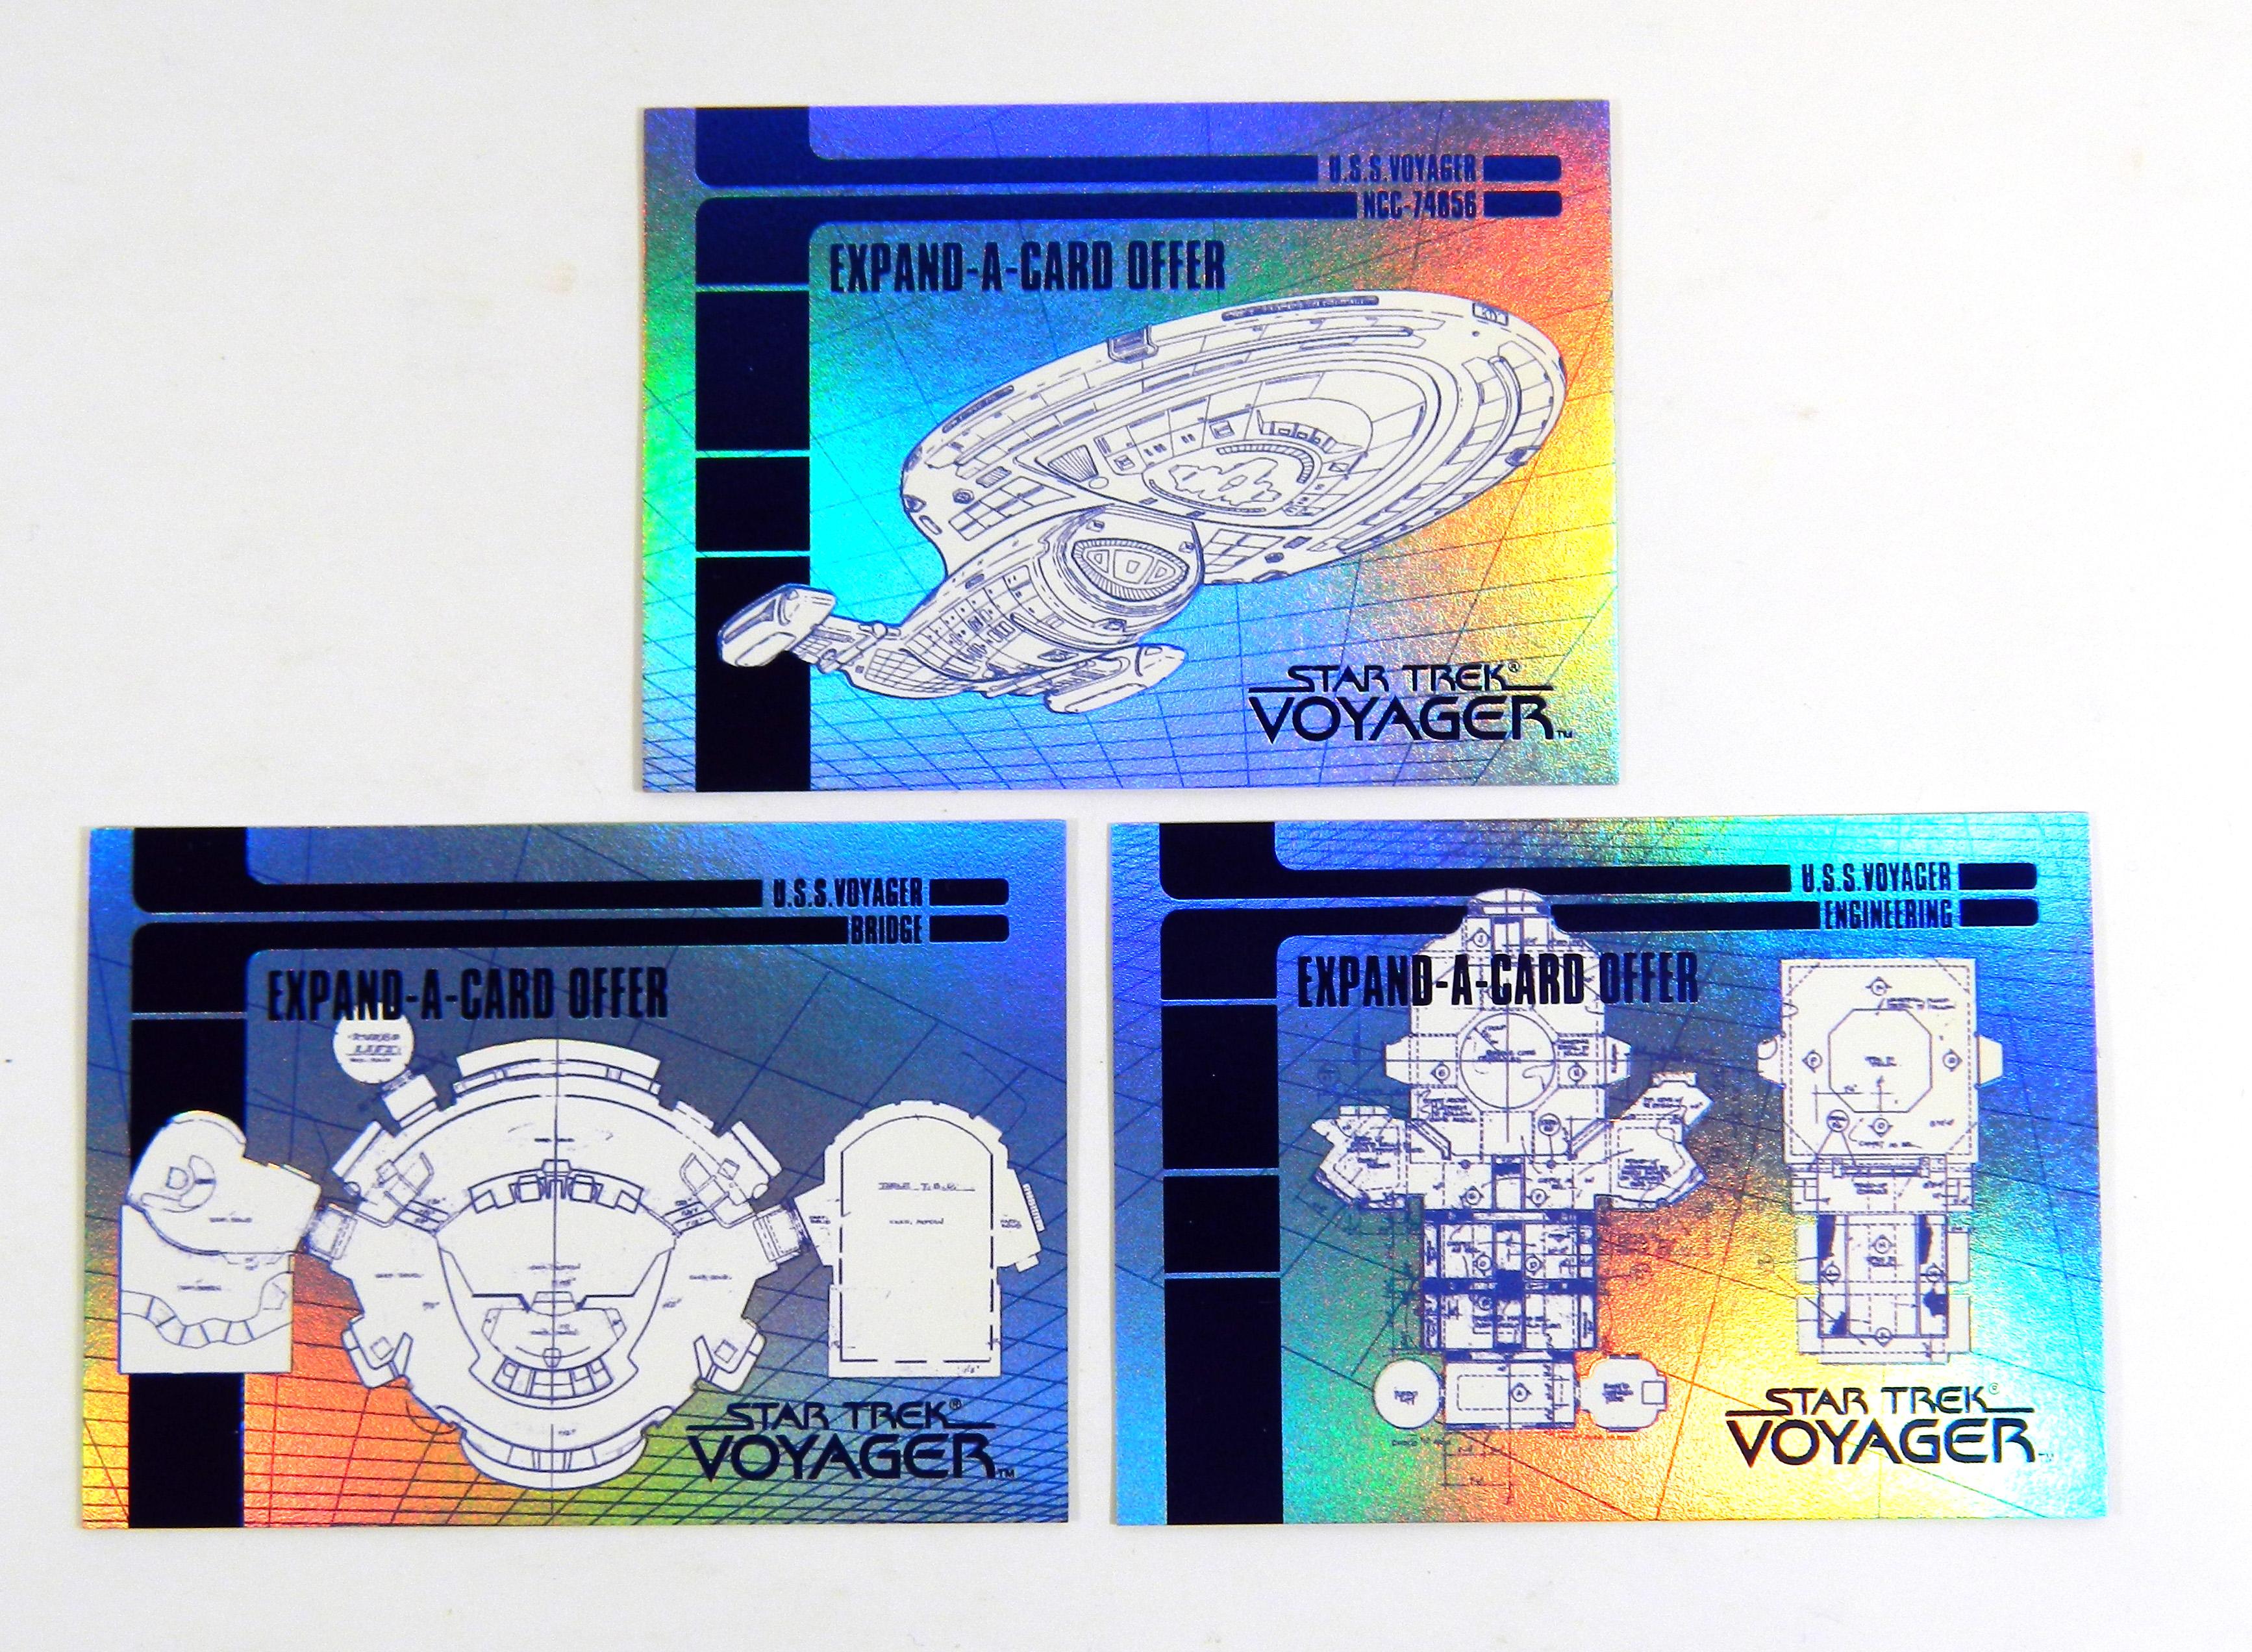 STAR TREK VOYAGER SEASON 1 SERIES 1 Complete BLUEPRINT EXPAND OFFER Card Set 3